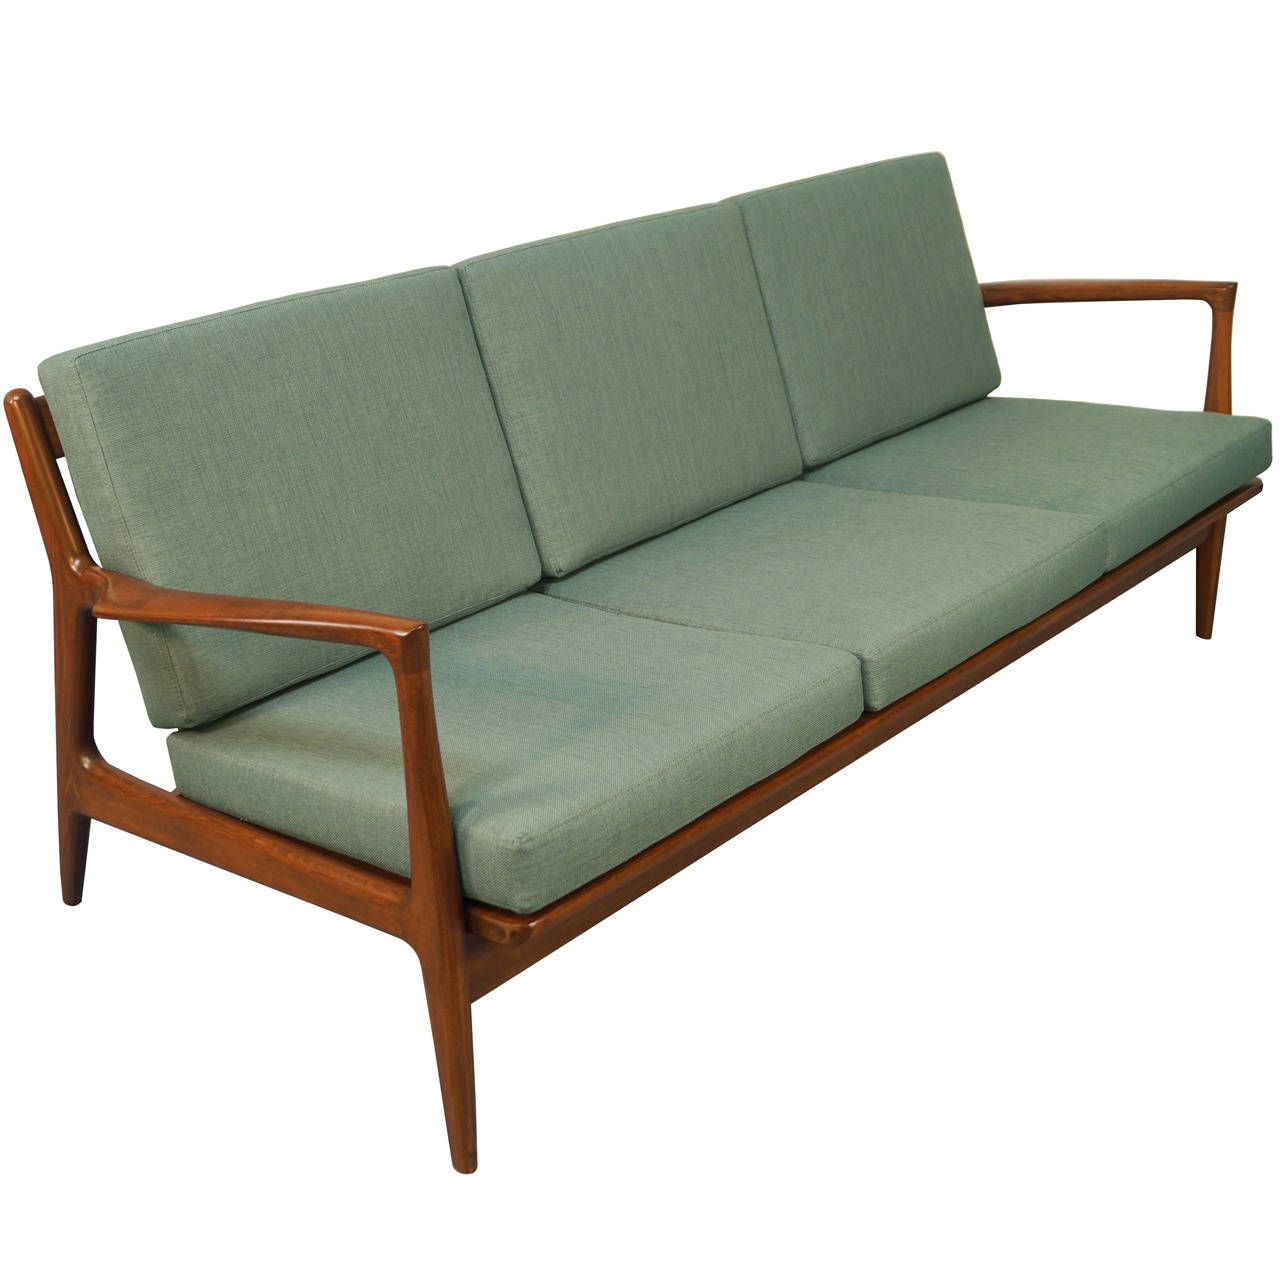 Danish Modern Sofa By Ib Kofod Ln 1stdibs